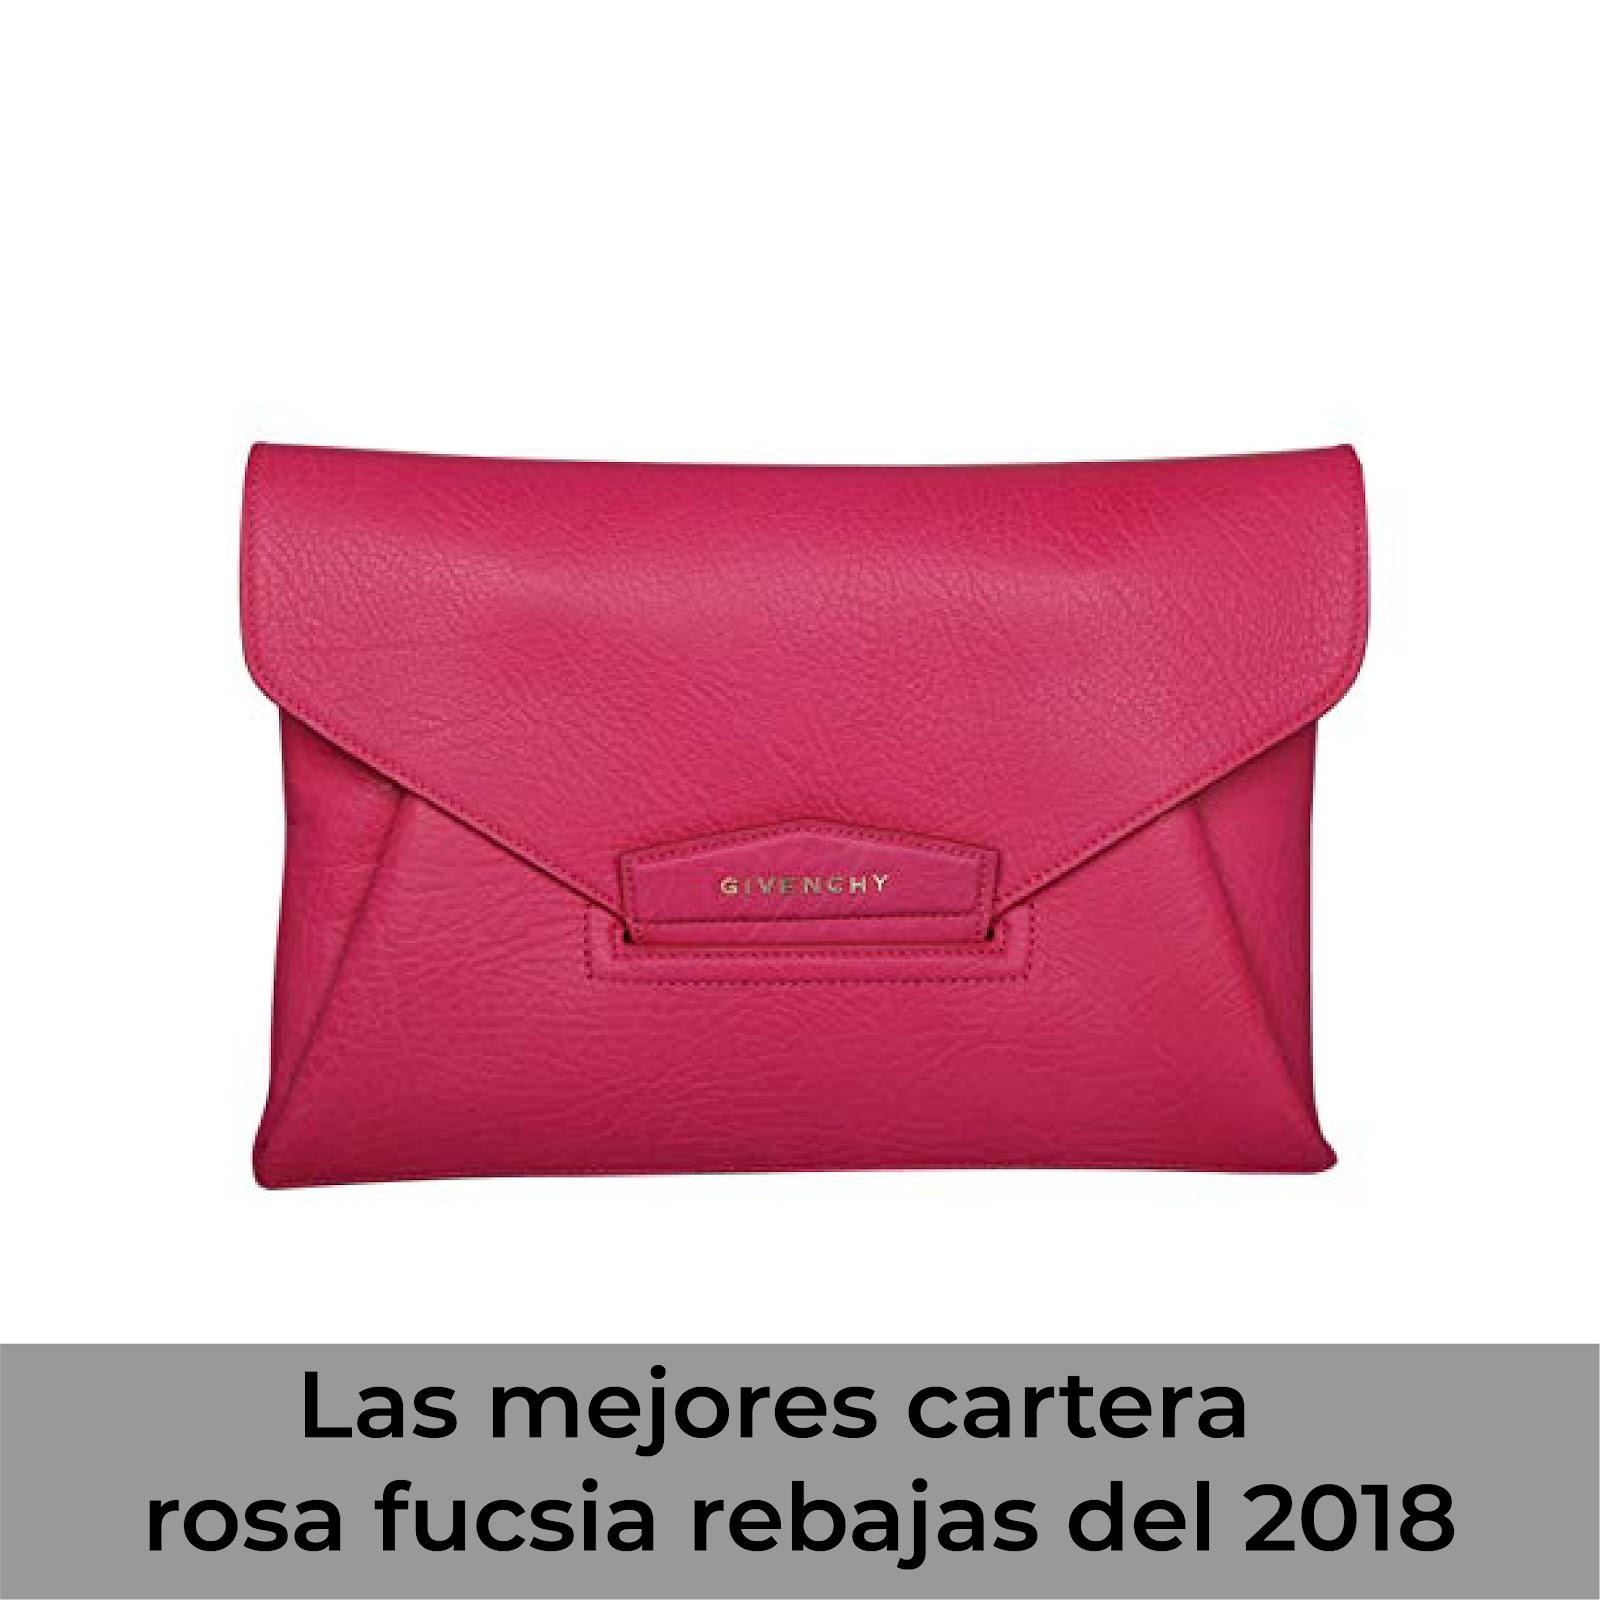 ebea74ad2 Cartera rosa fucsia - Luce como una estrella - TusMaletas.net